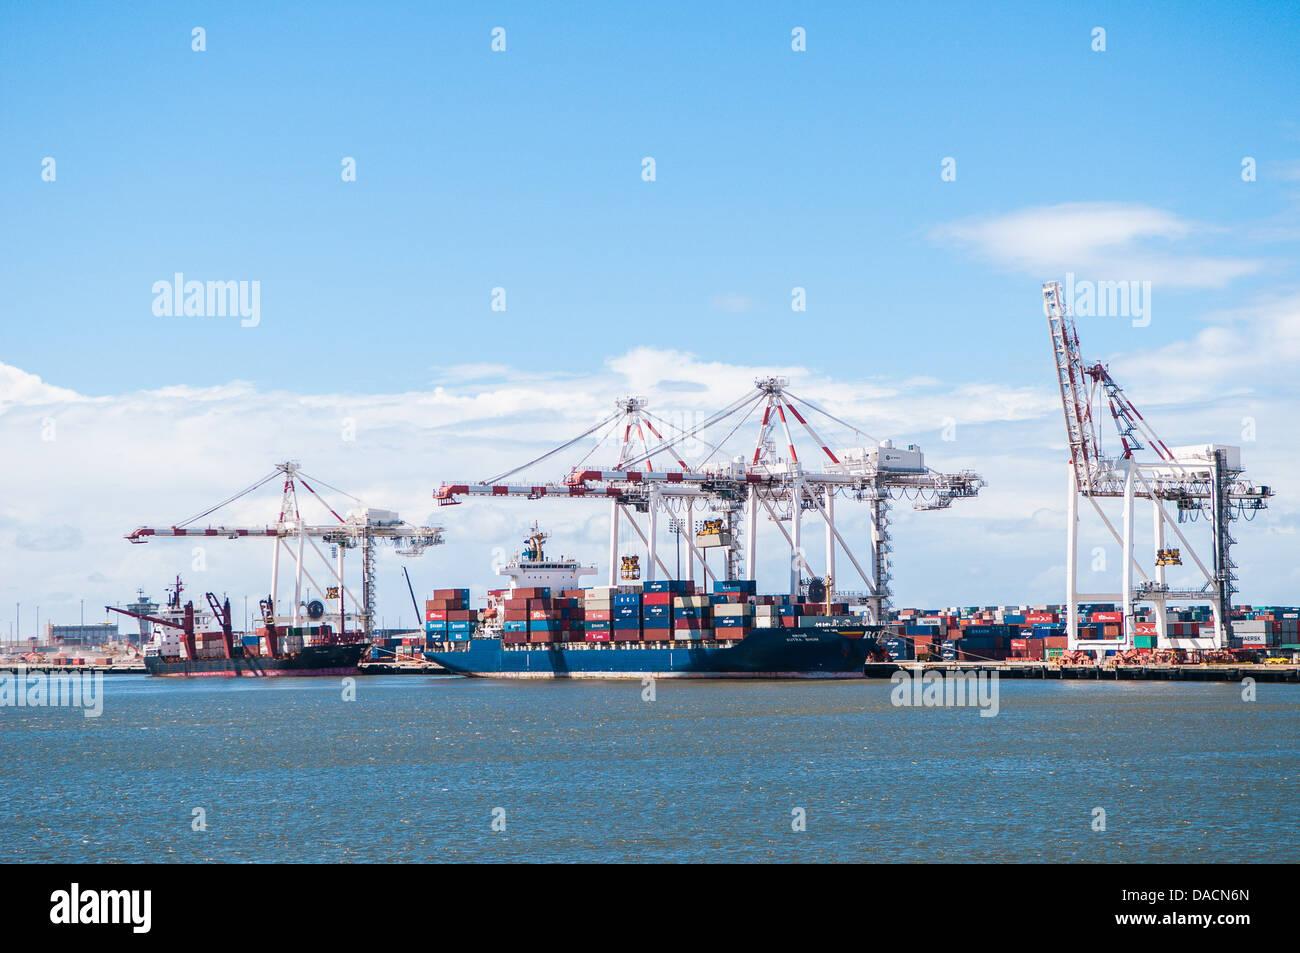 Unloading container ships, Port of Brisbane,Queensland, Australia - Stock Image